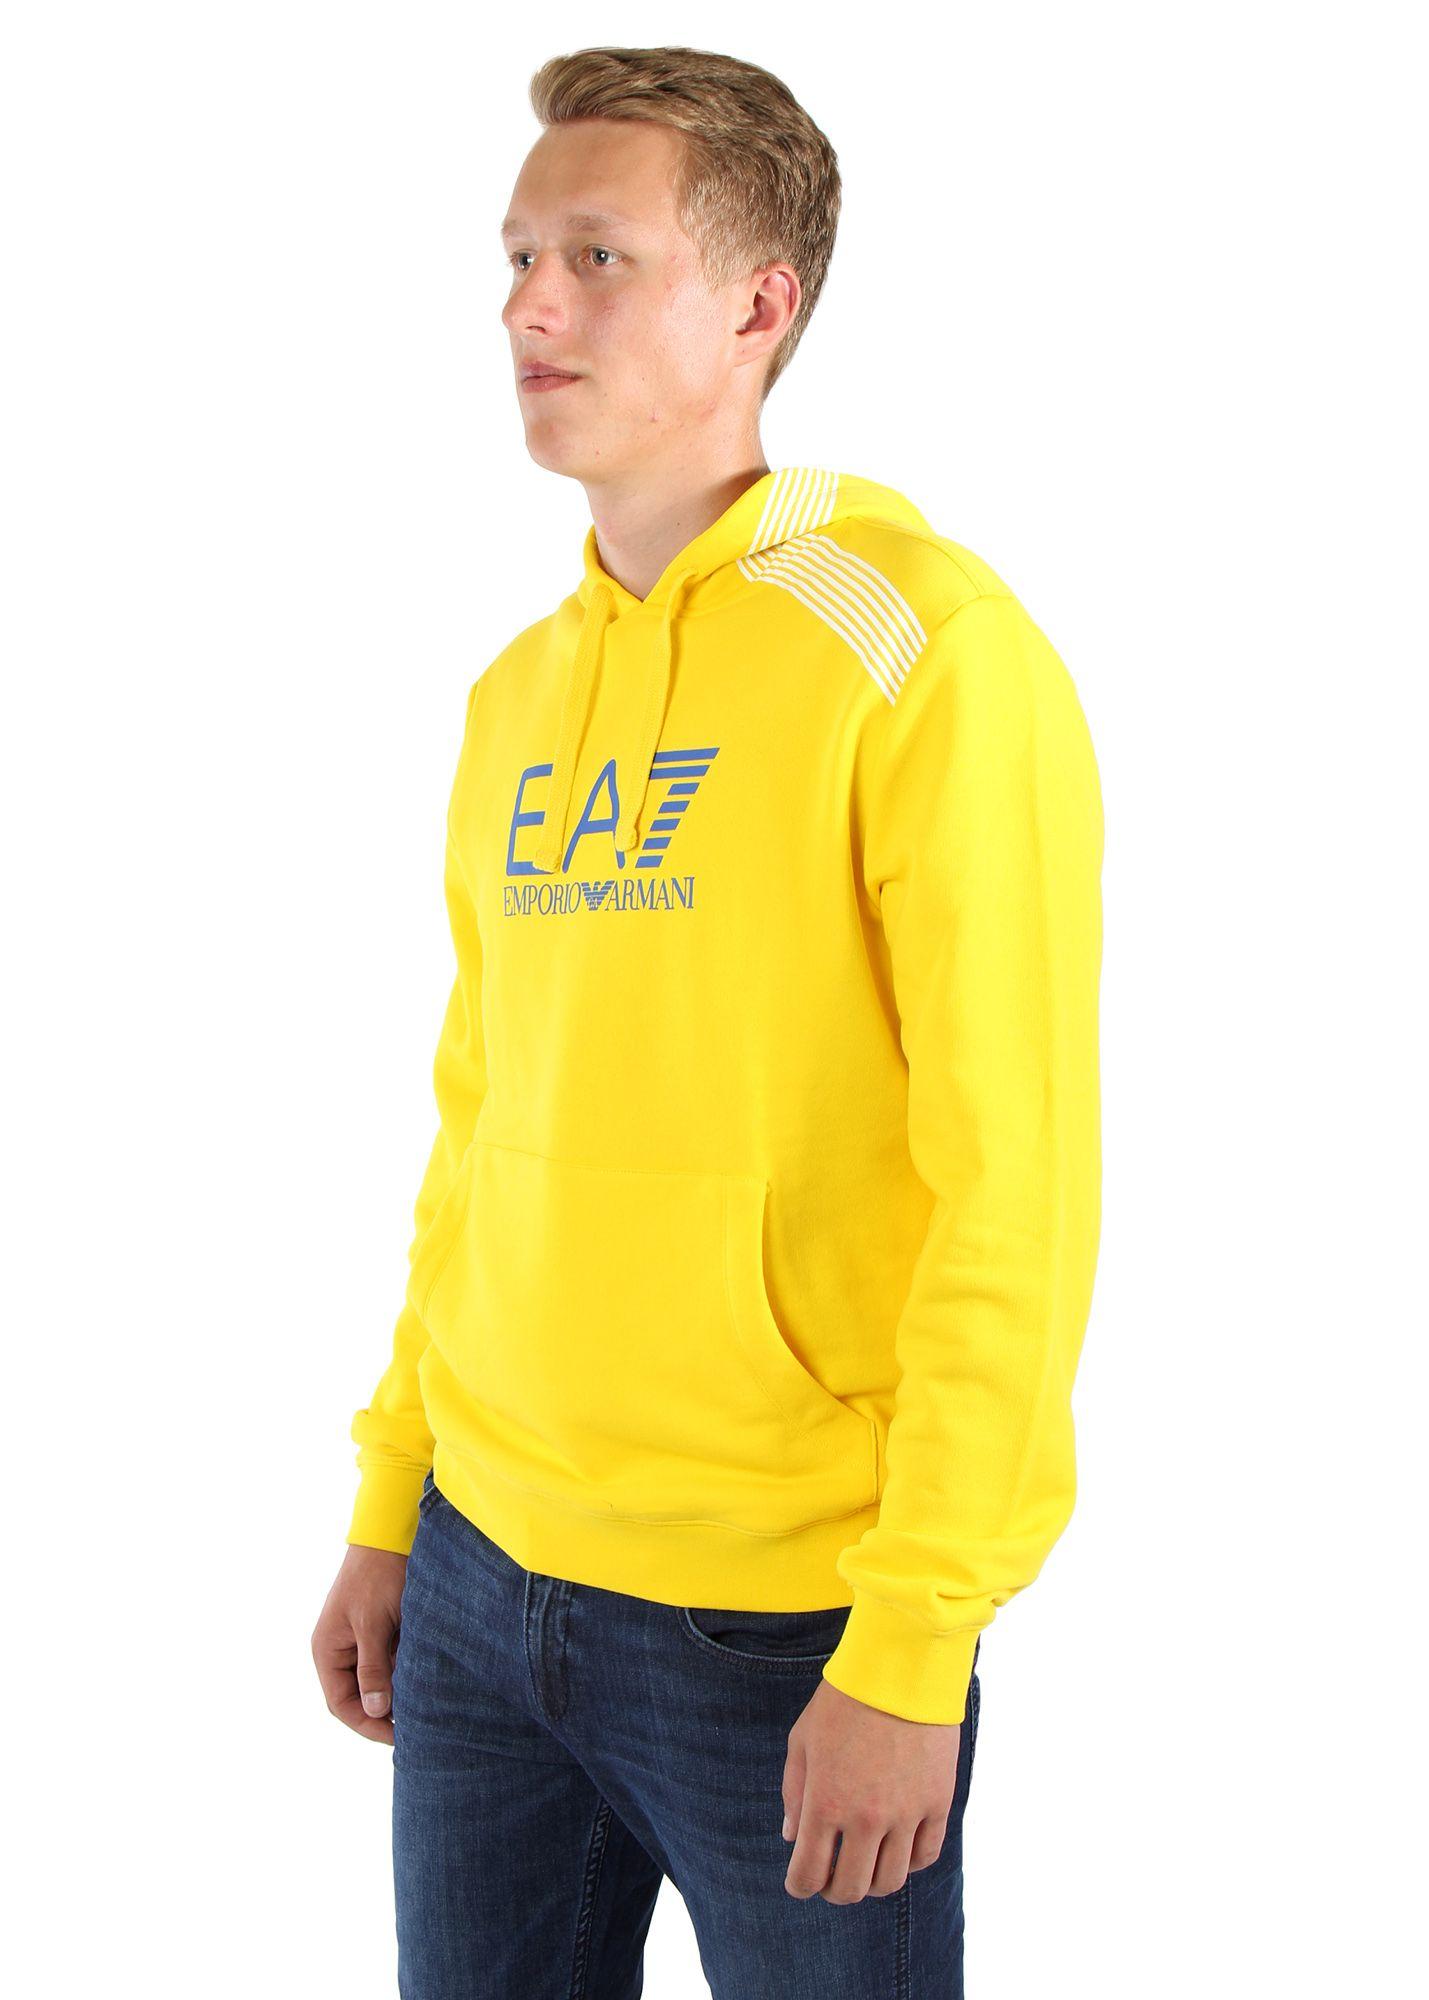 187b7ba8f7 EMPORIO ARMANI Hoodie 74 EUR #hoodie #armani #onlineboutique | KOKOS ...